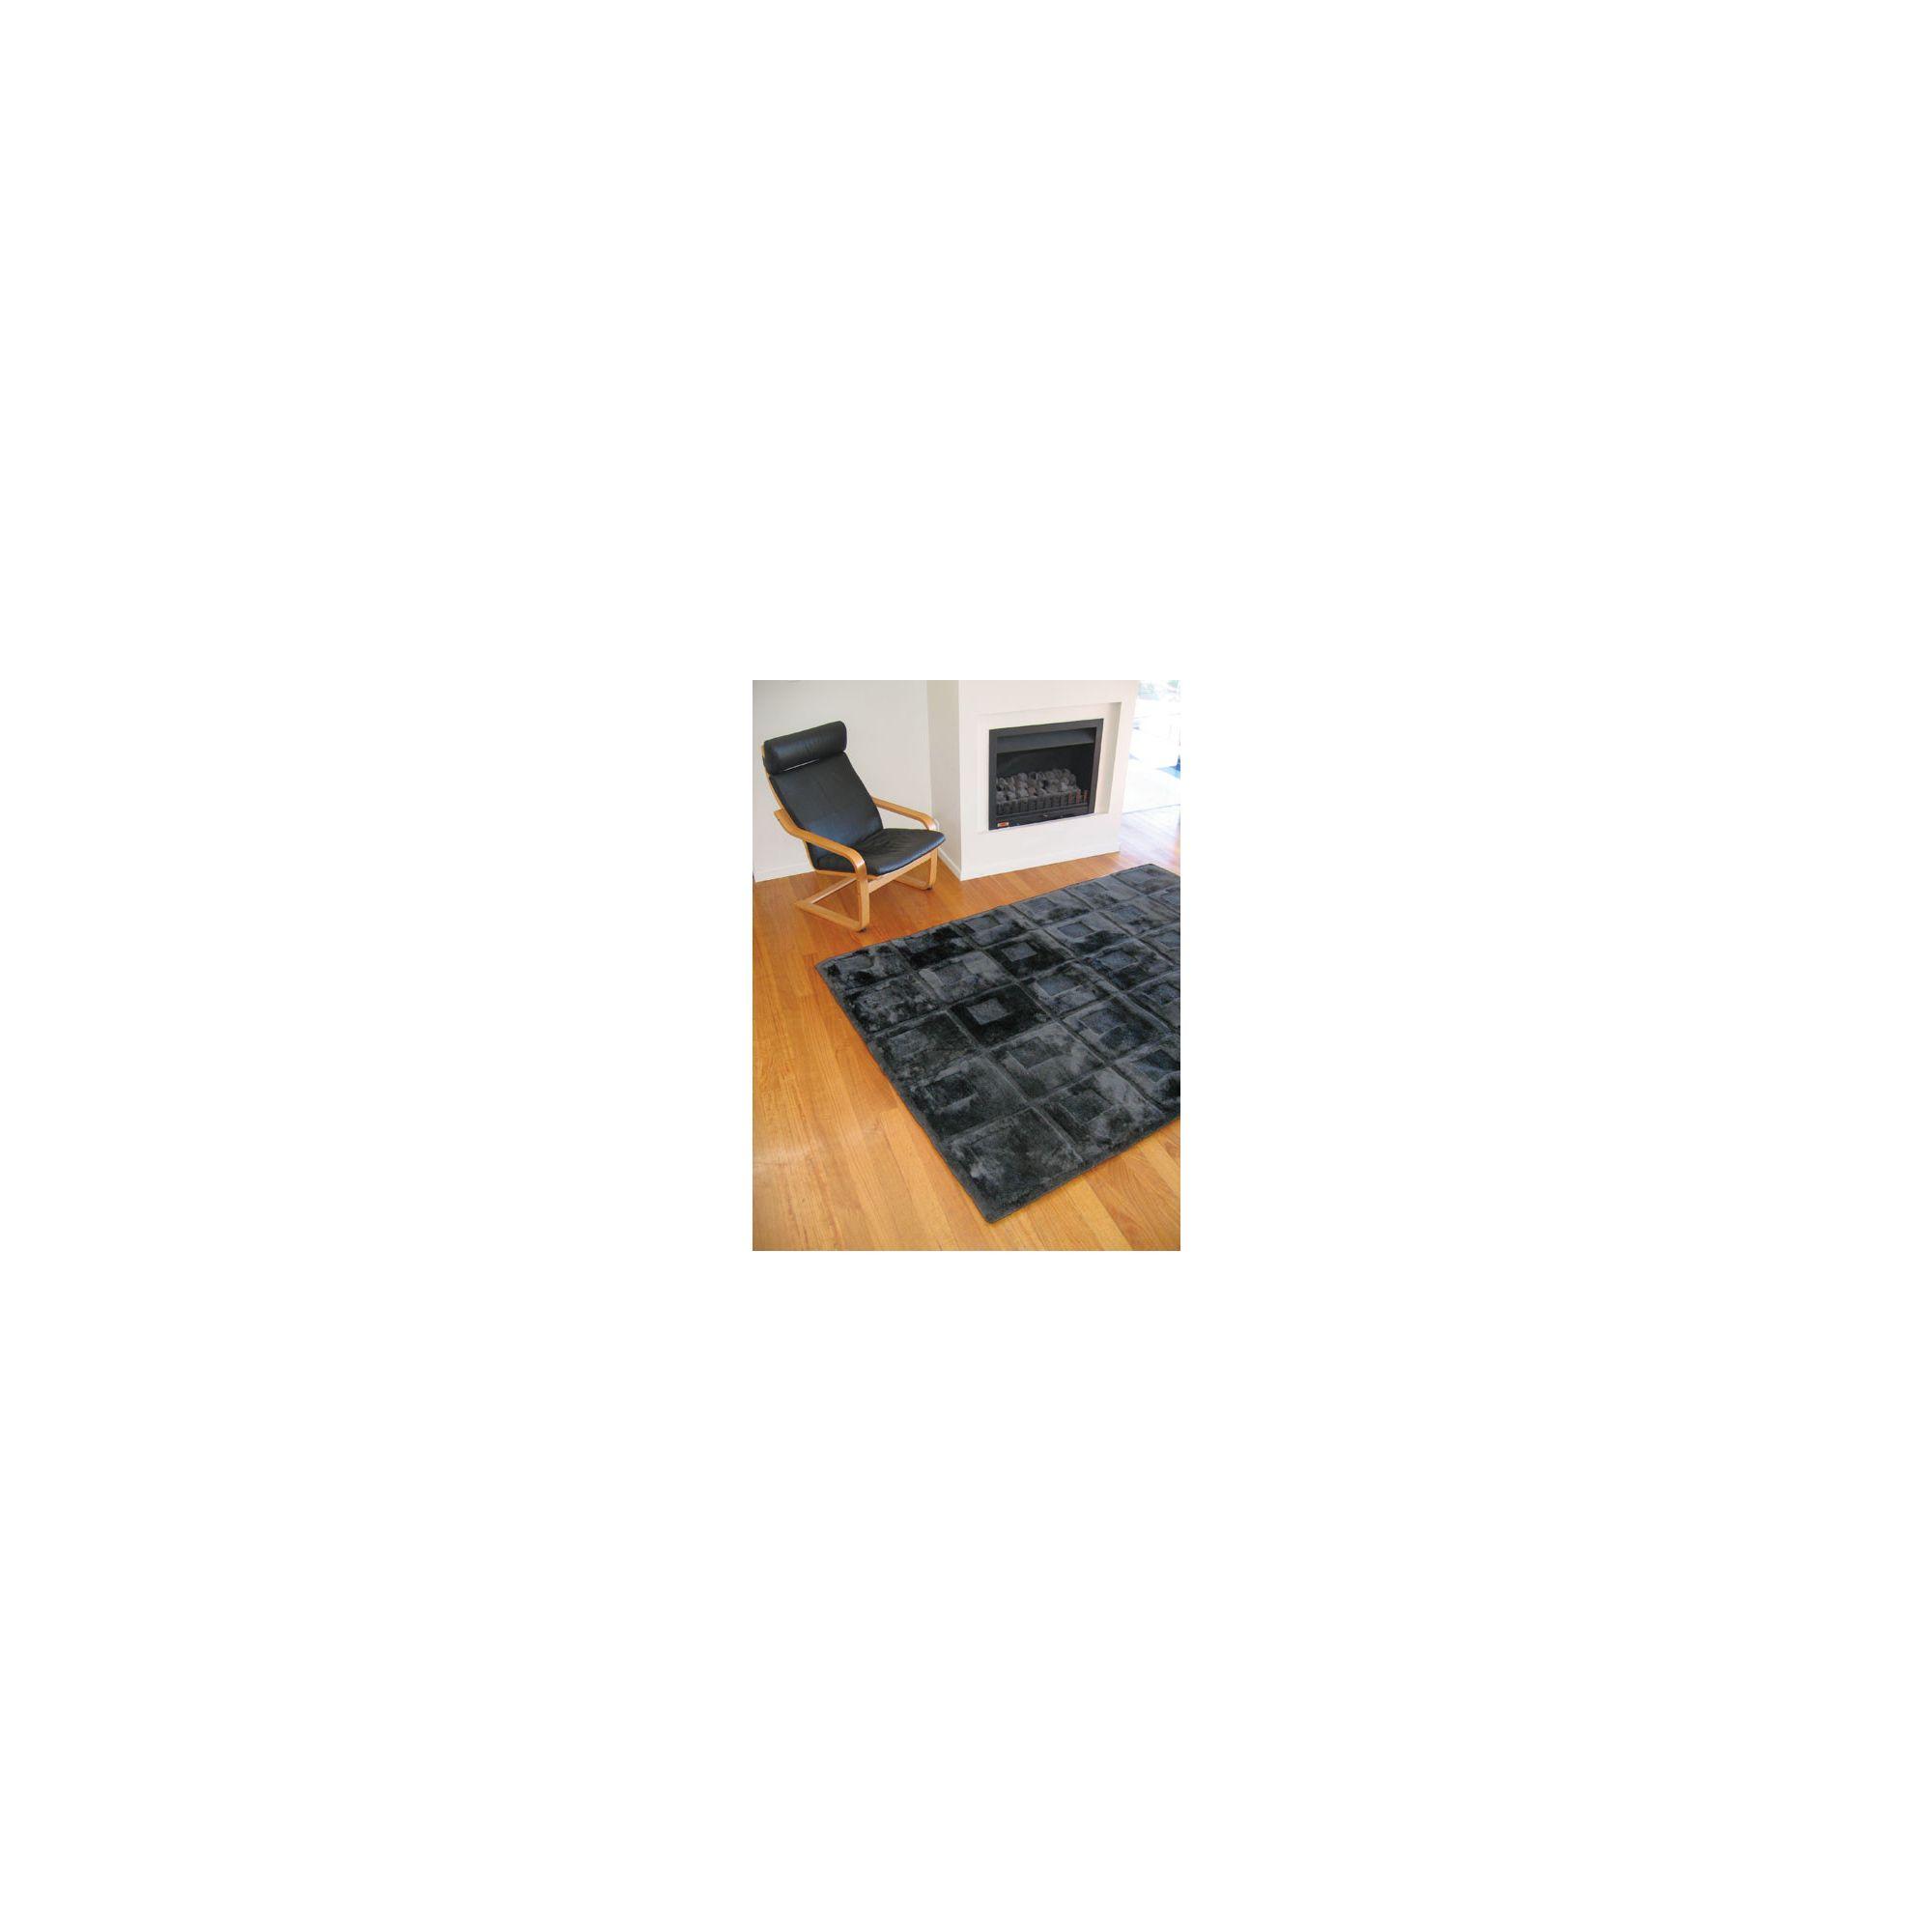 Bowron Sheepskin Shortwool Design Orbit Black Rug - 180cm H x 120cm W x 1cm D at Tesco Direct